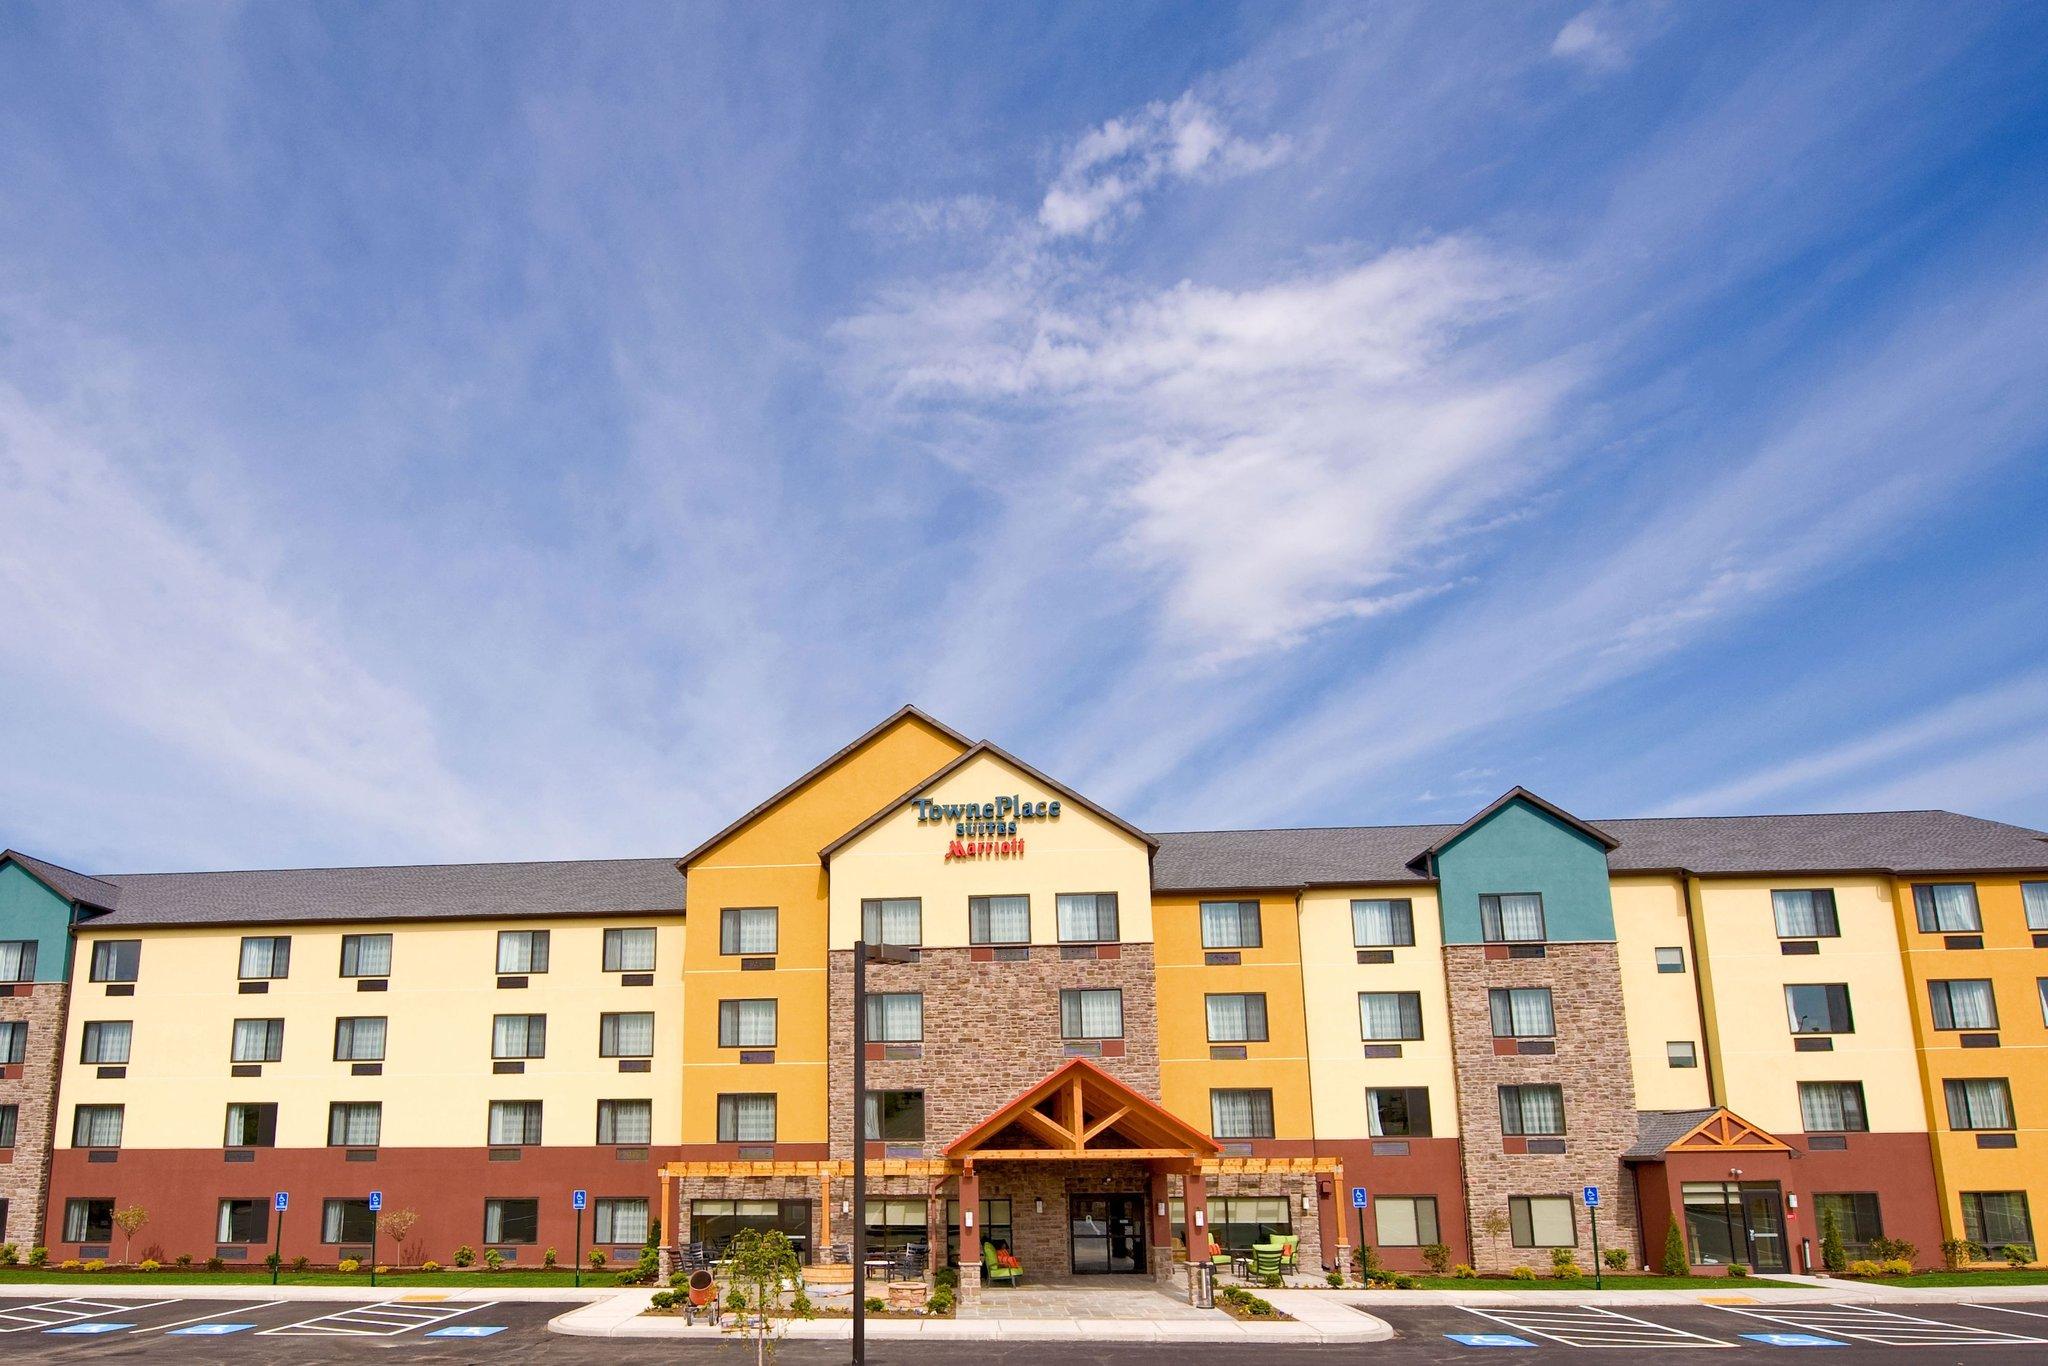 TownePlace Suites Scranton Wilkes-Barre